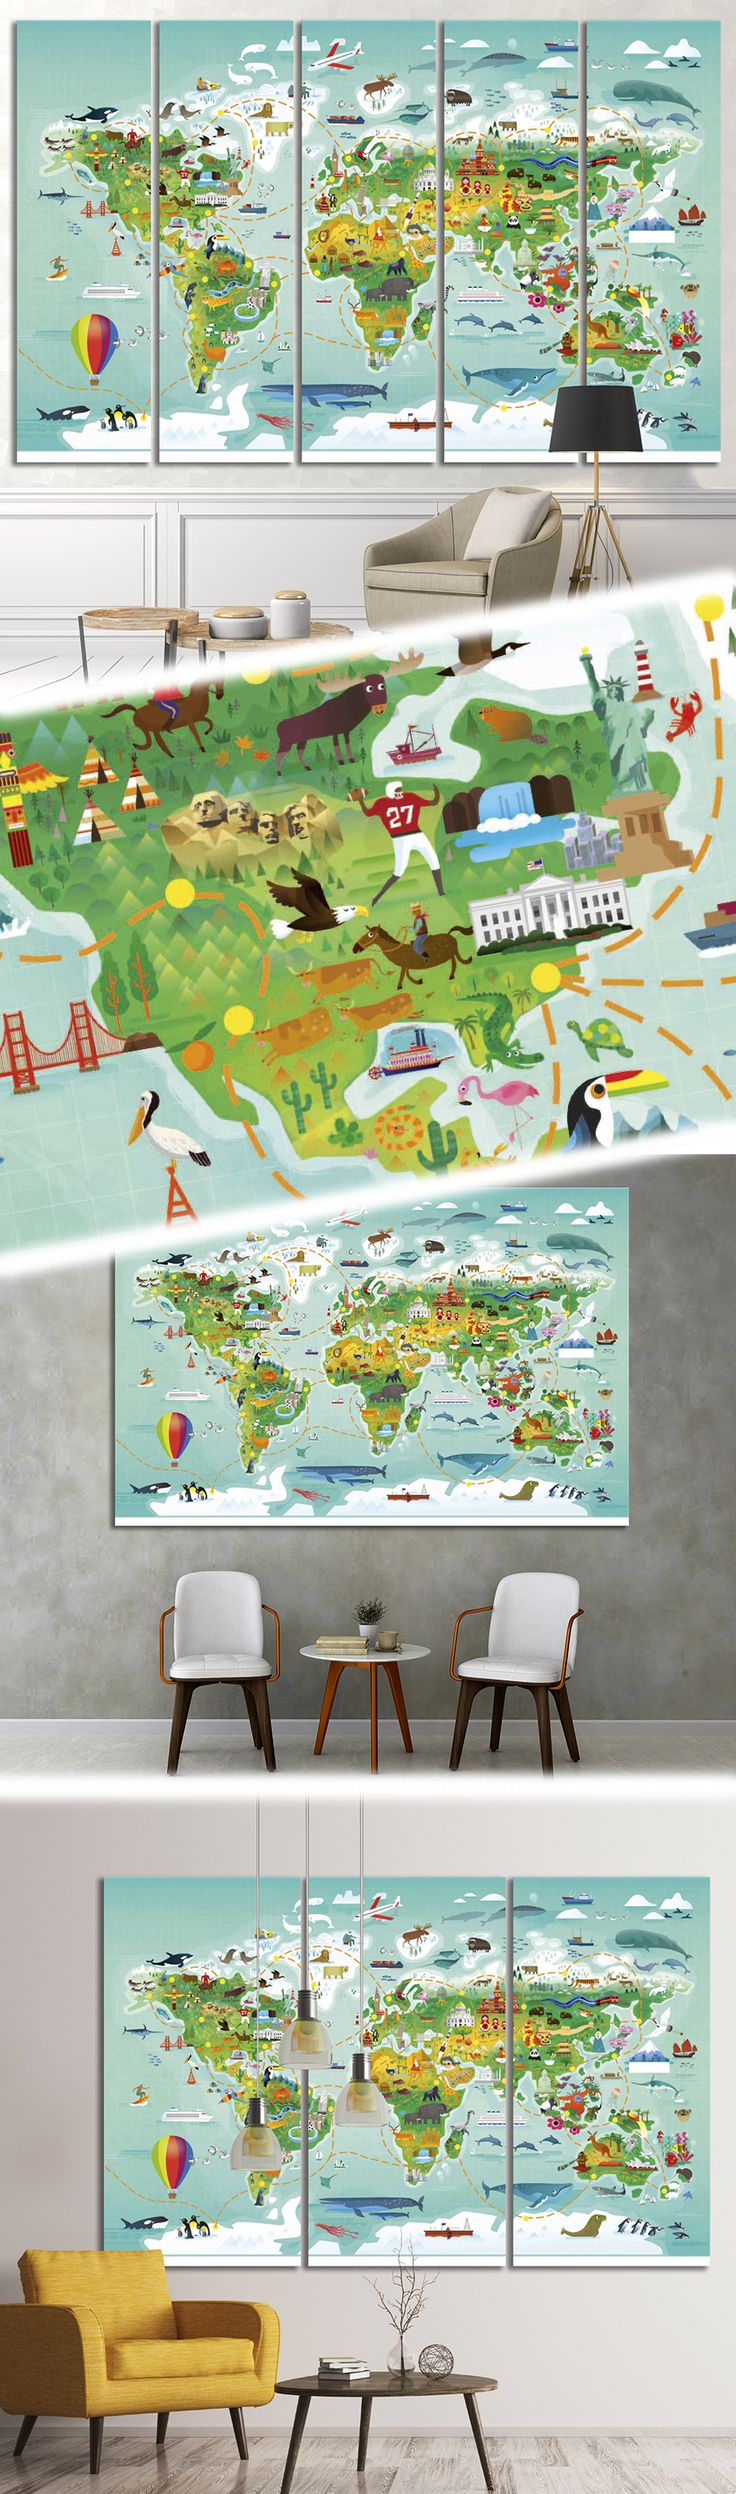 World map for kids32 Framed Canvas Print